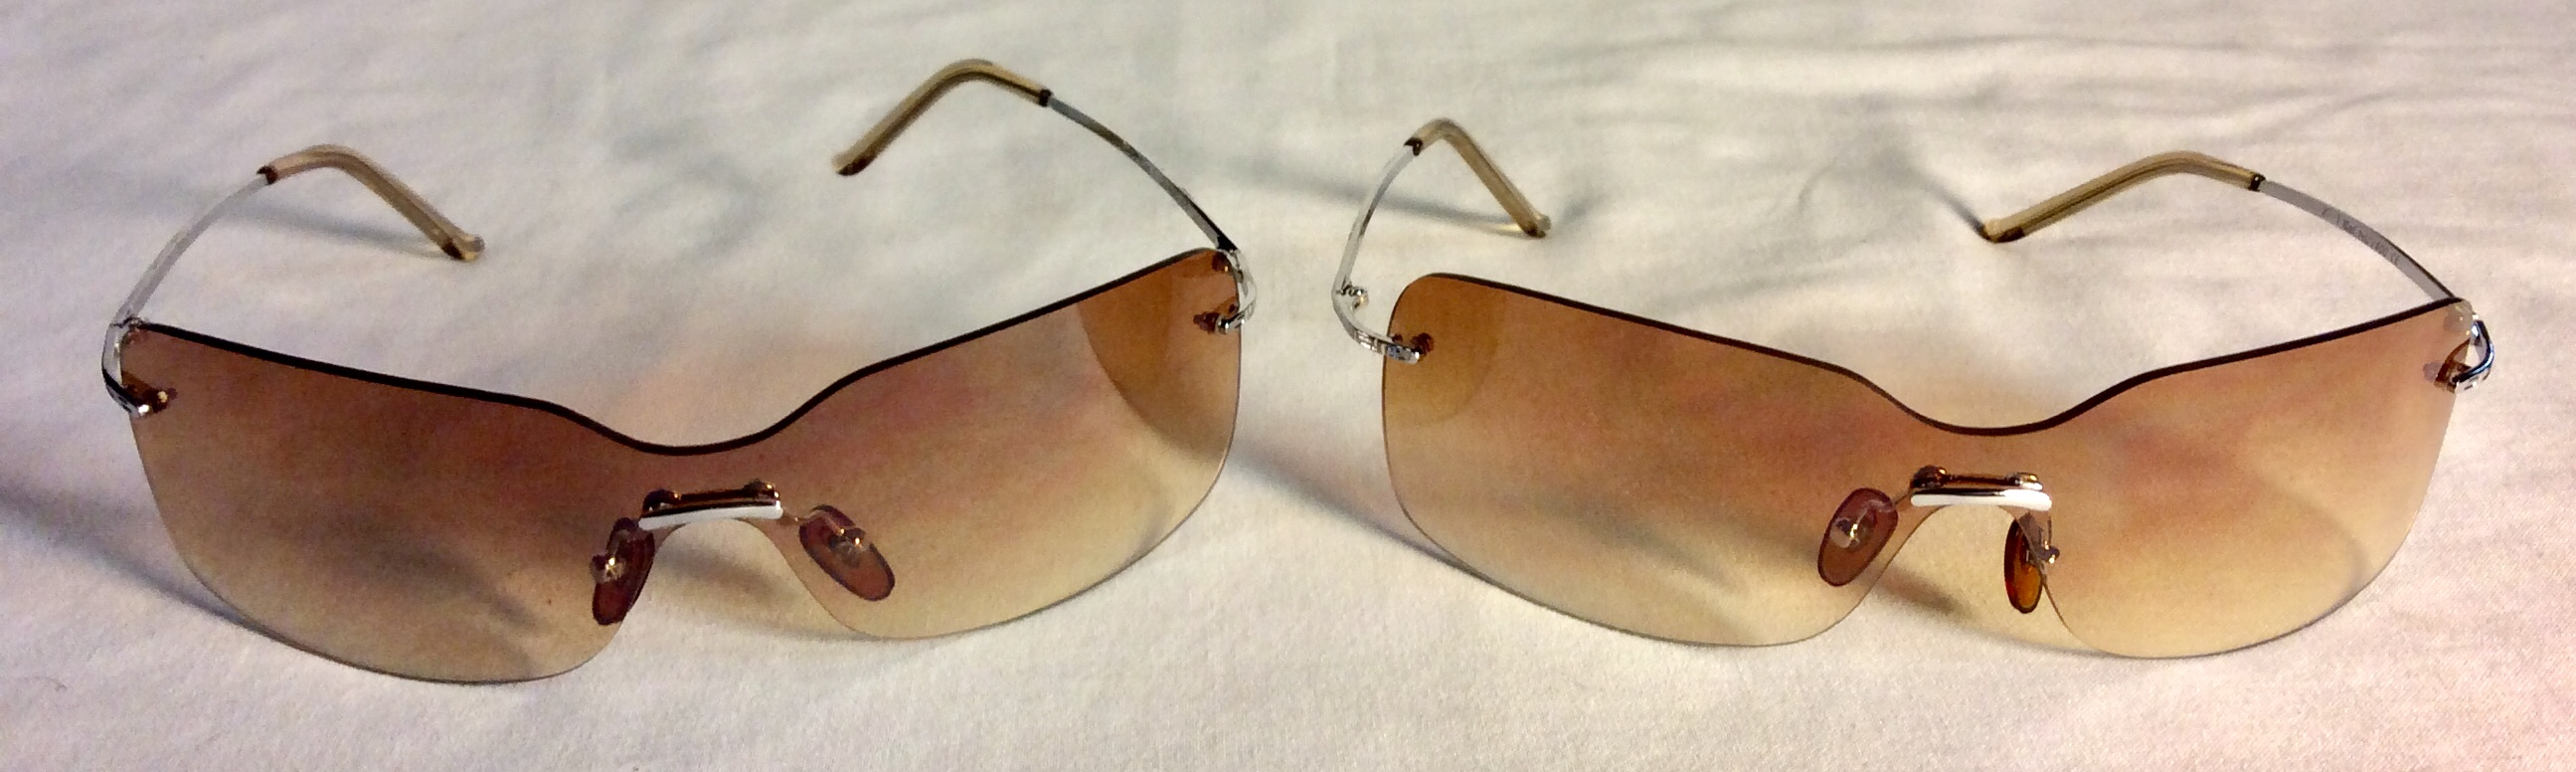 Silver frame sunglasses